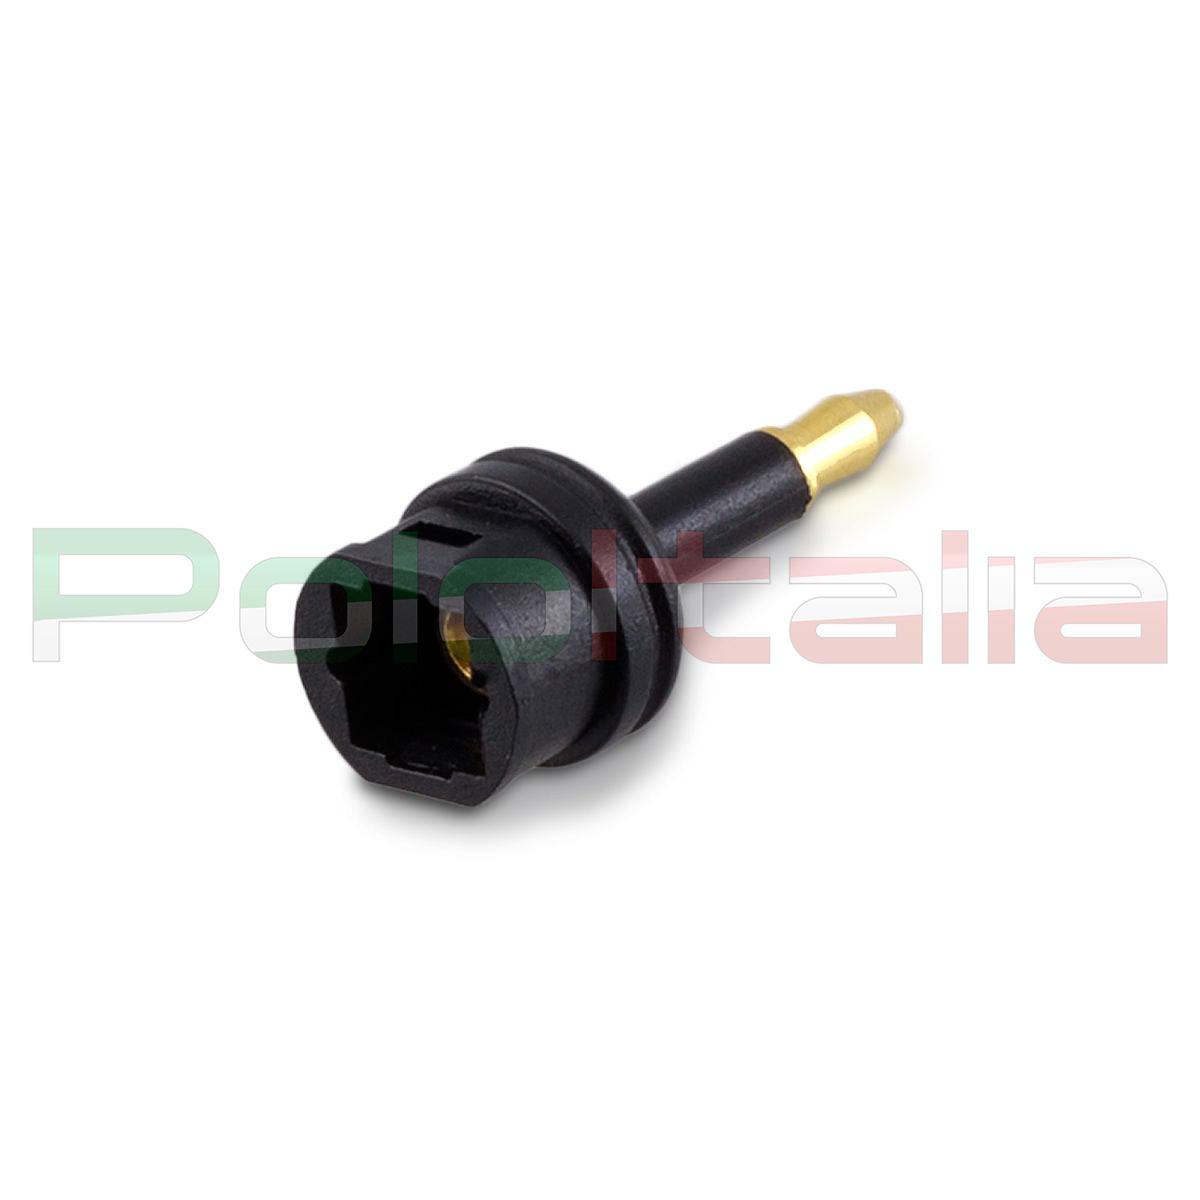 b5ba63546b57aa Adaptateur optique TOSLINK Audio numérique Toslink Jack   span class    notranslate      span  3,5 mm mâle